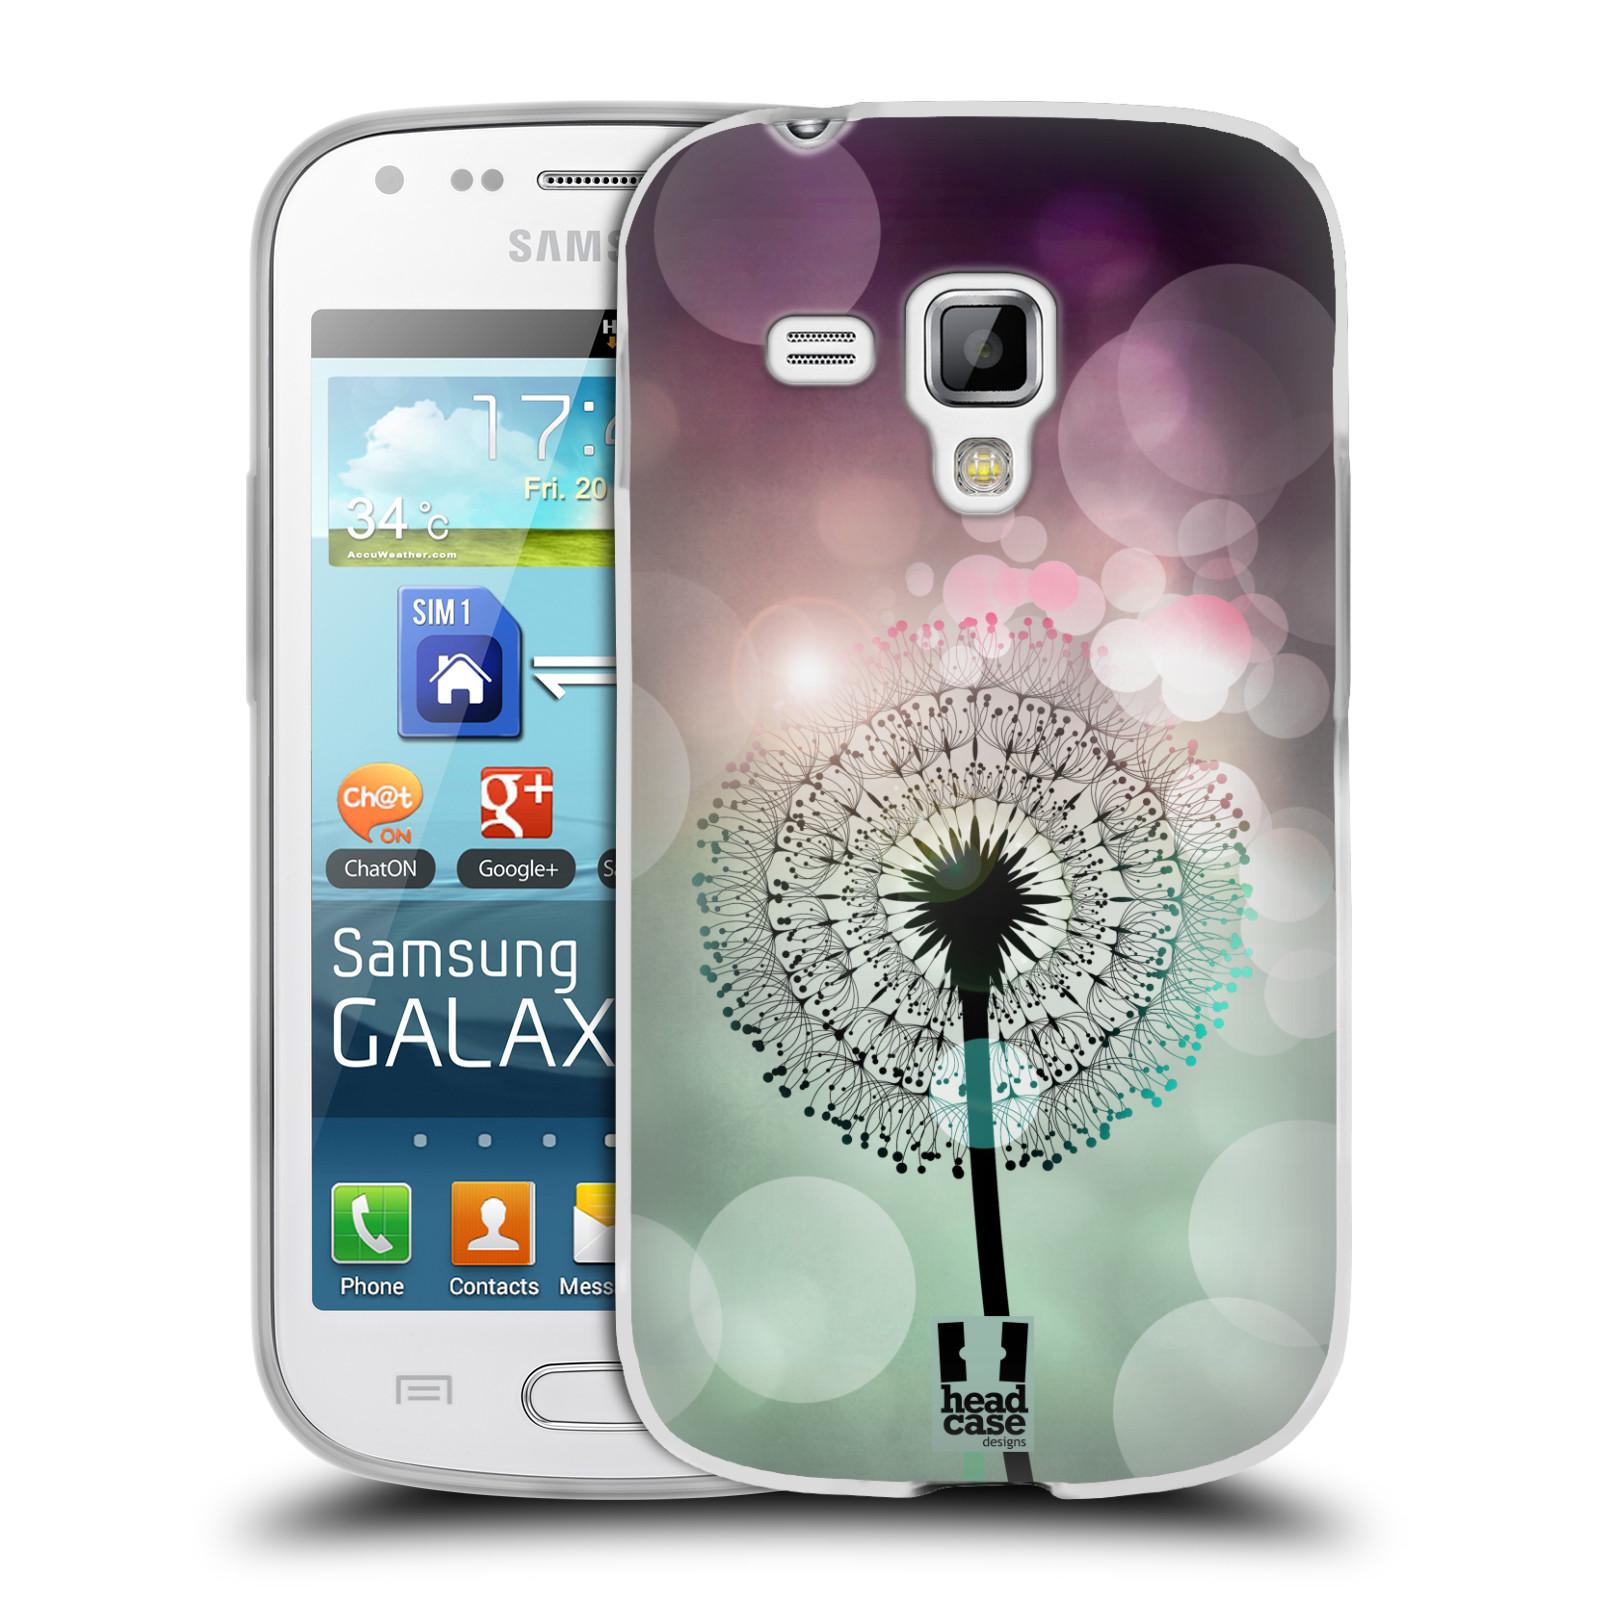 Silikonové pouzdro na mobil Samsung Galaxy S Duos HEAD CASE Pampeliškové odlesky (Silikonový kryt či obal na mobilní telefon Samsung Galaxy S Duos GT-S7562)